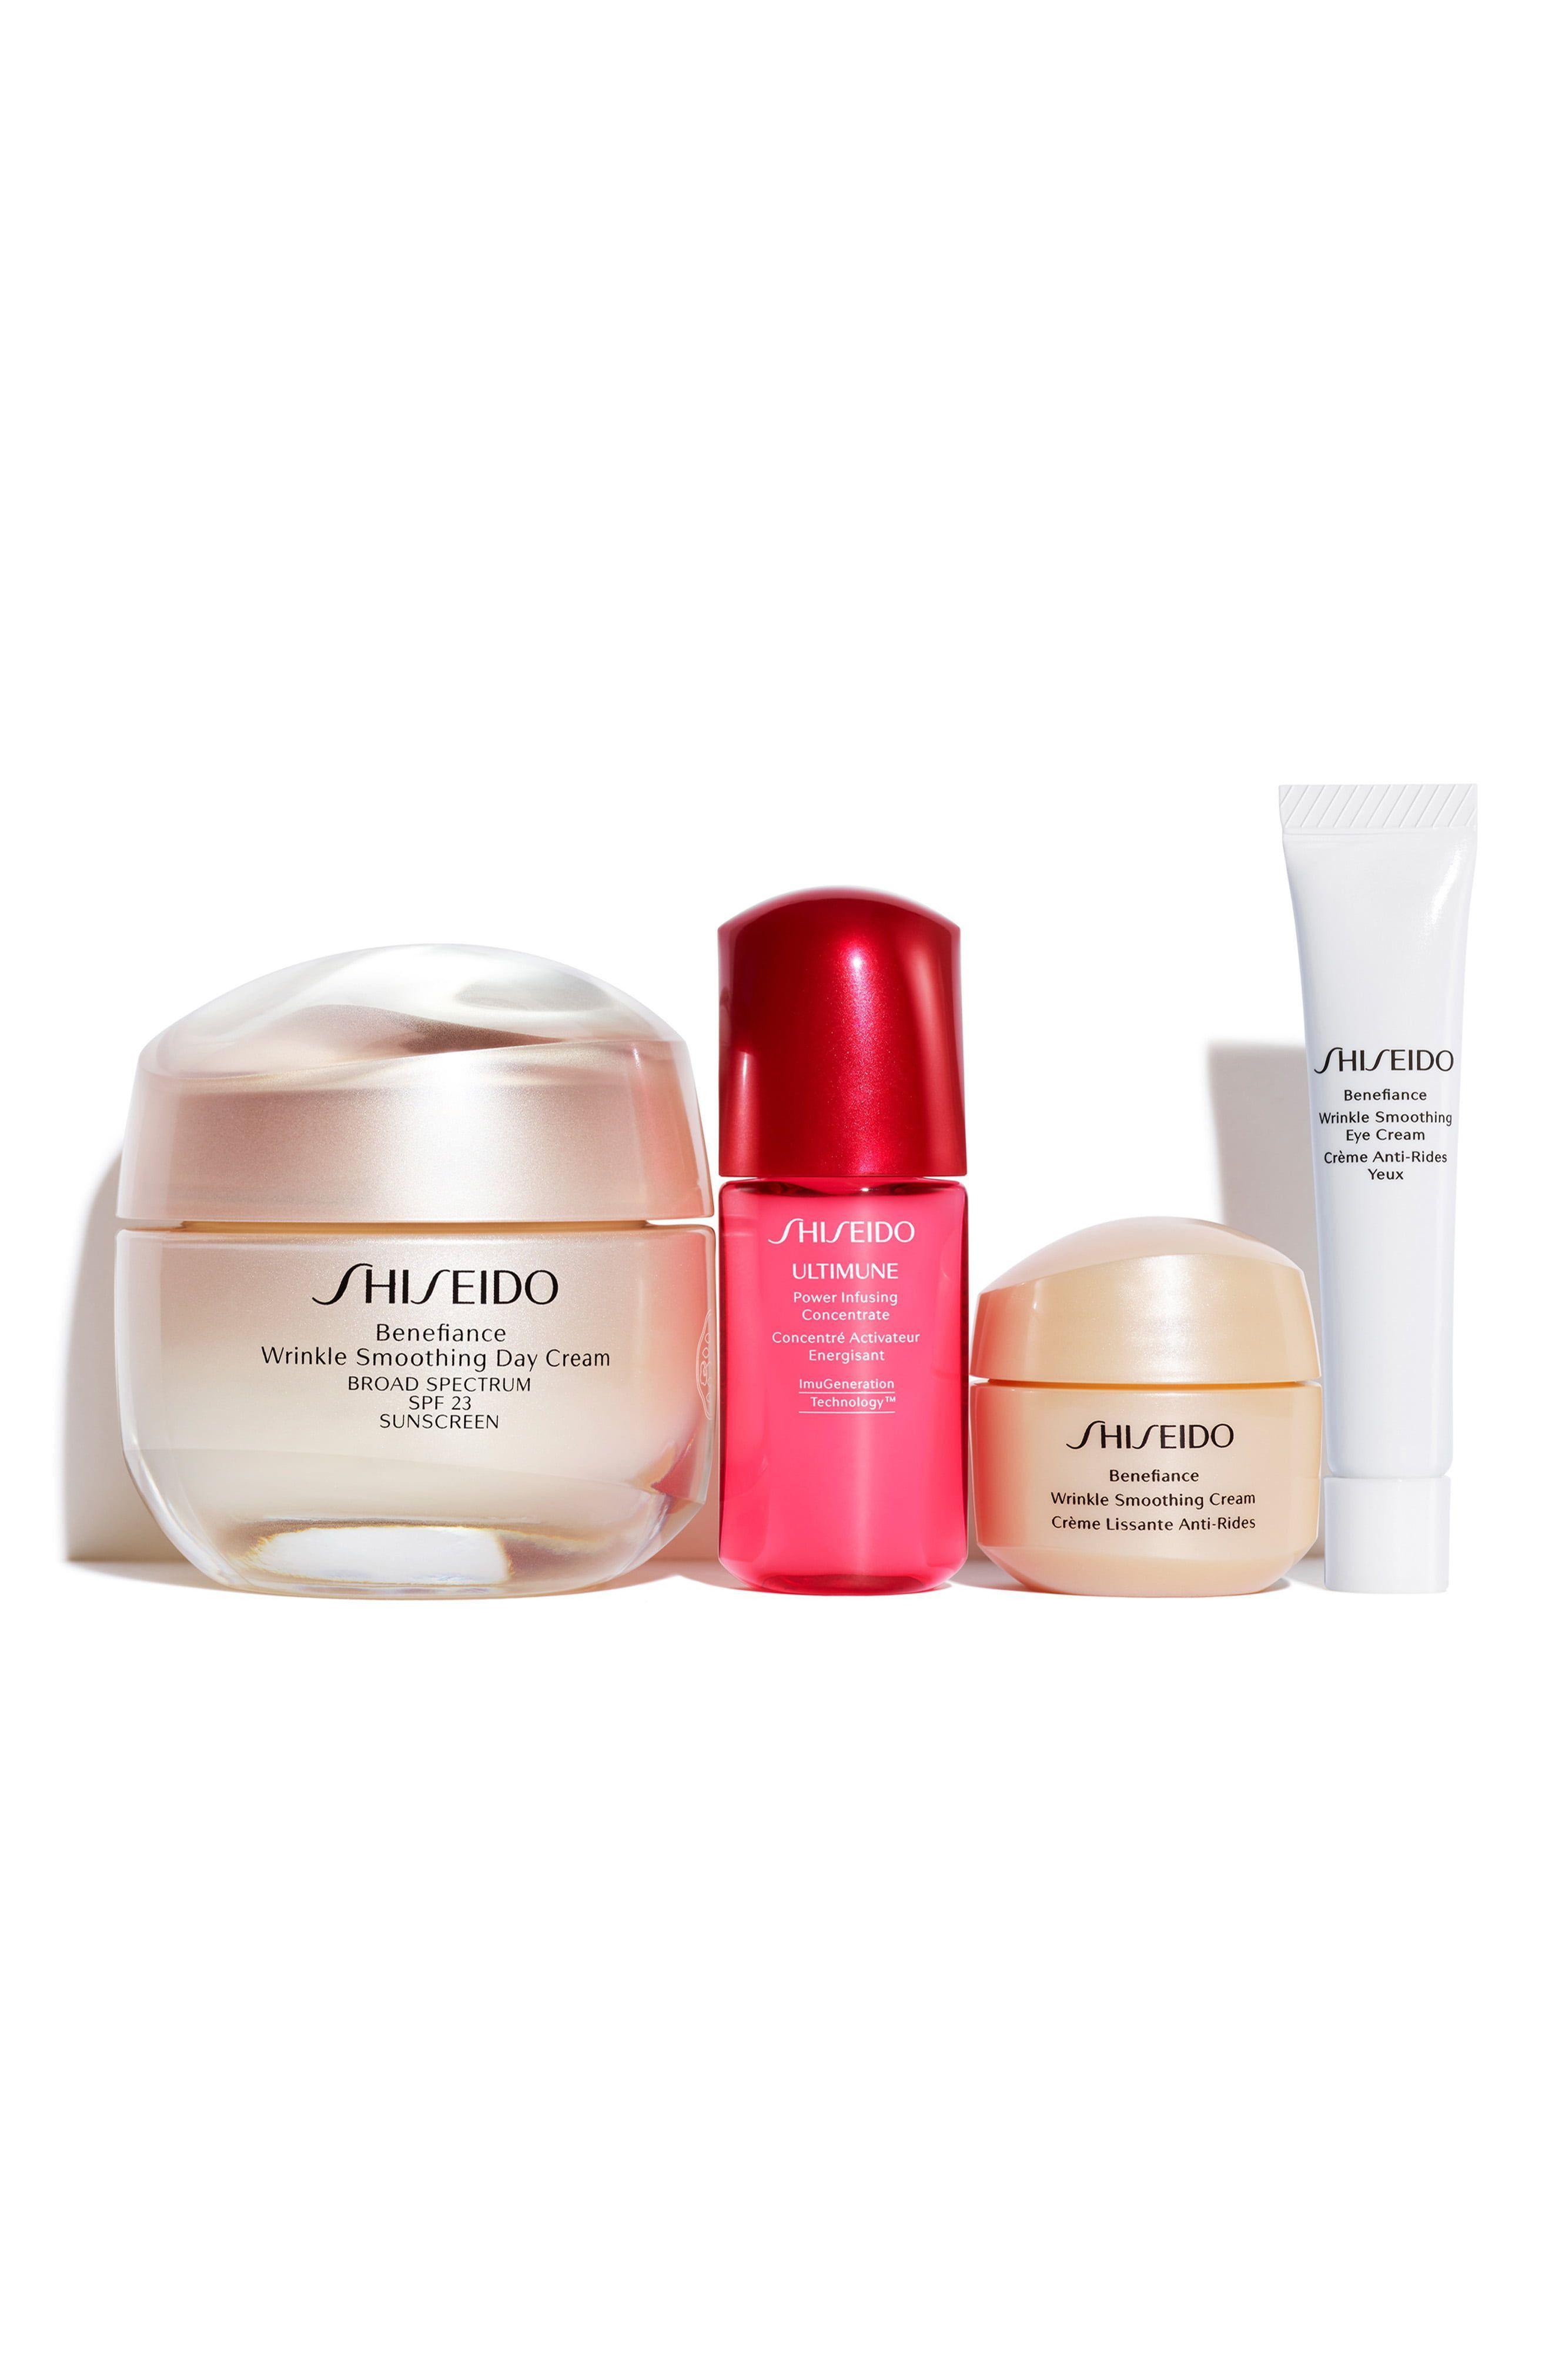 Shiseido Benefiance Smooth Skin Sensations Skin In 2020 Lotion For Oily Skin Natural Acne Skin Care Moisturizer For Oily Skin